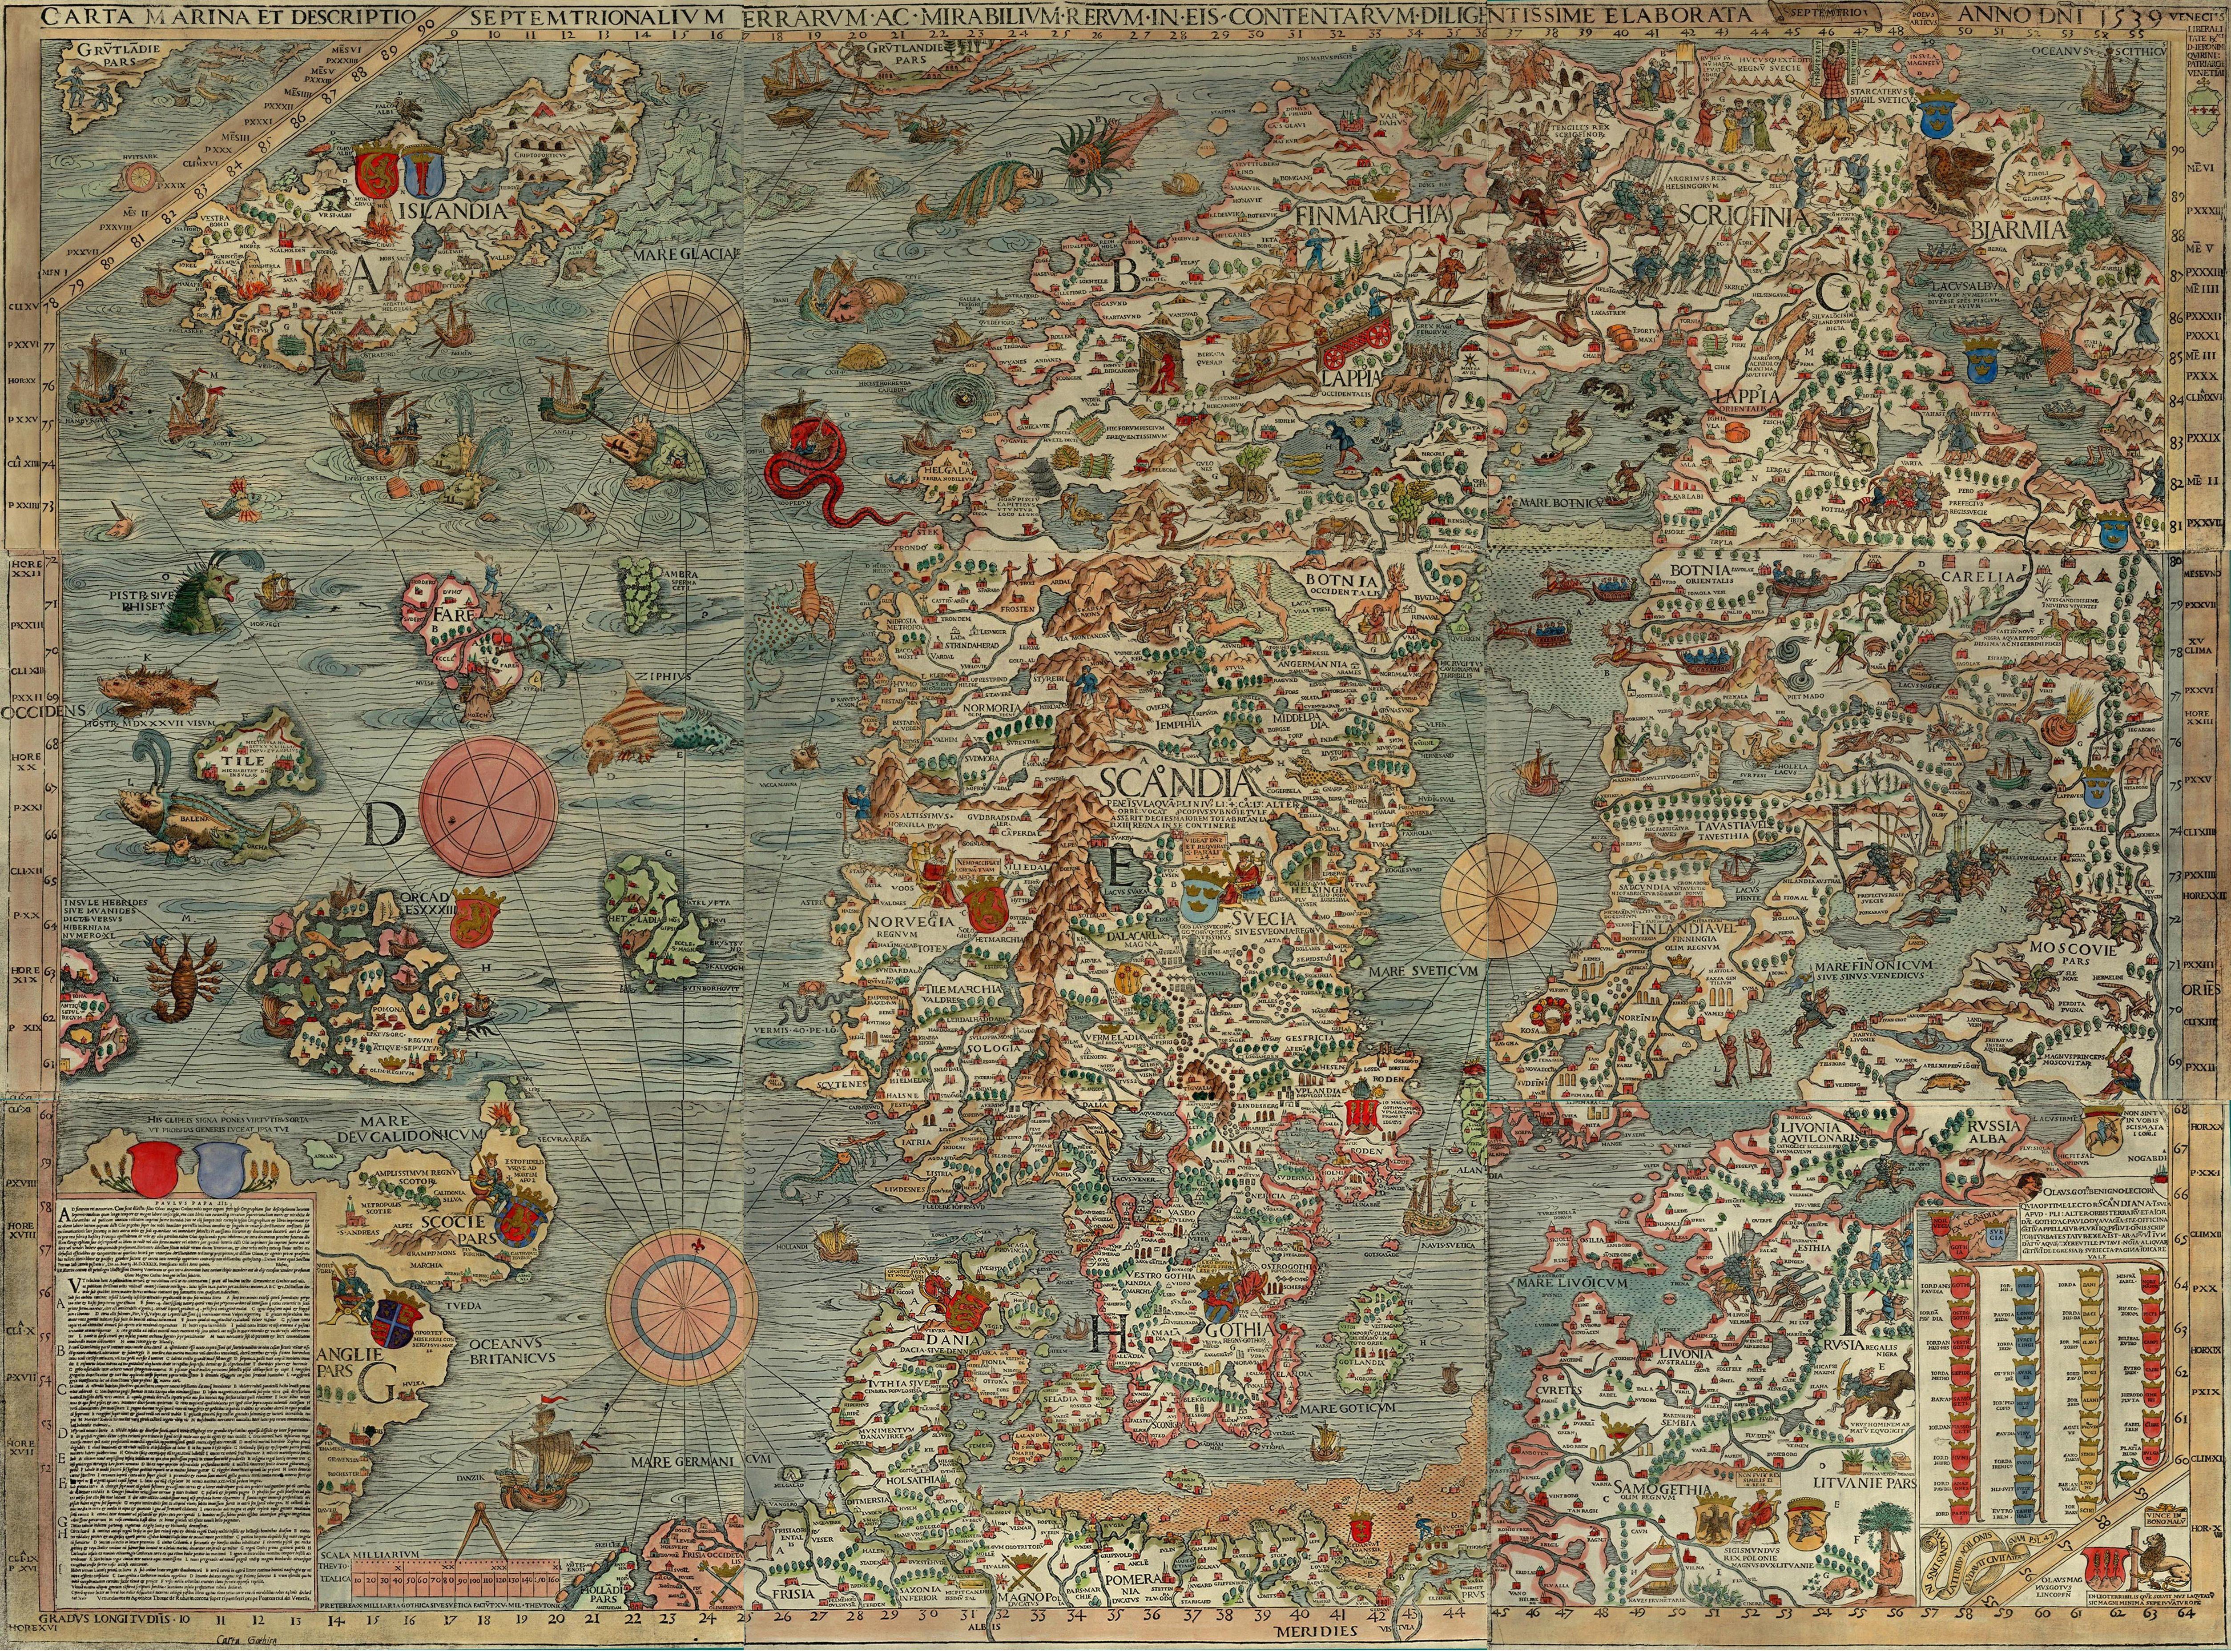 Carta Marina, Olaus Magnus' detailed illustrated1529 map of Scandinavia #maps #history #old